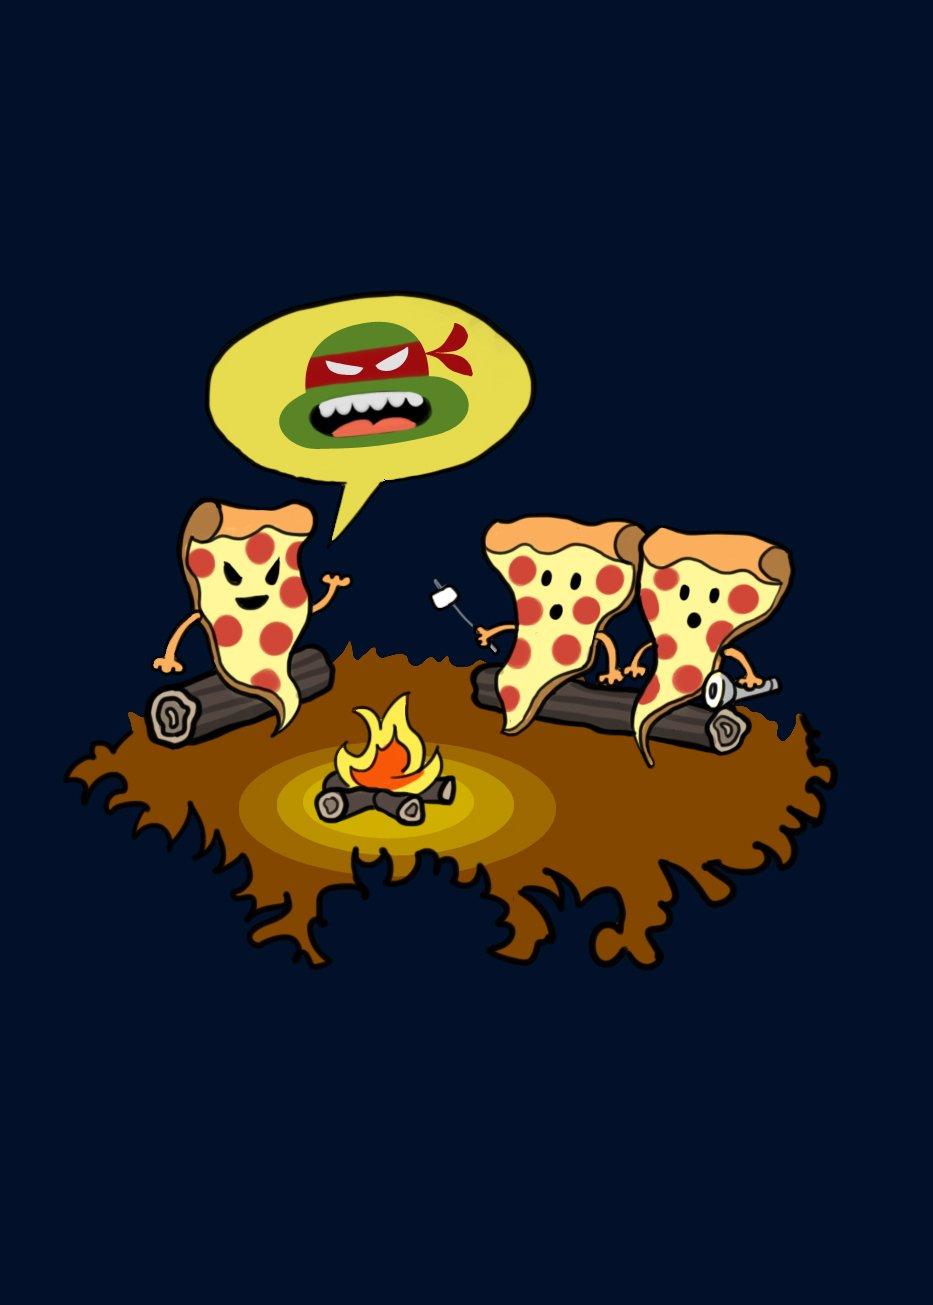 Pizza Horror Funny Turtle TV Show Cartoon Parody Rectangle Refrigerator Magnet